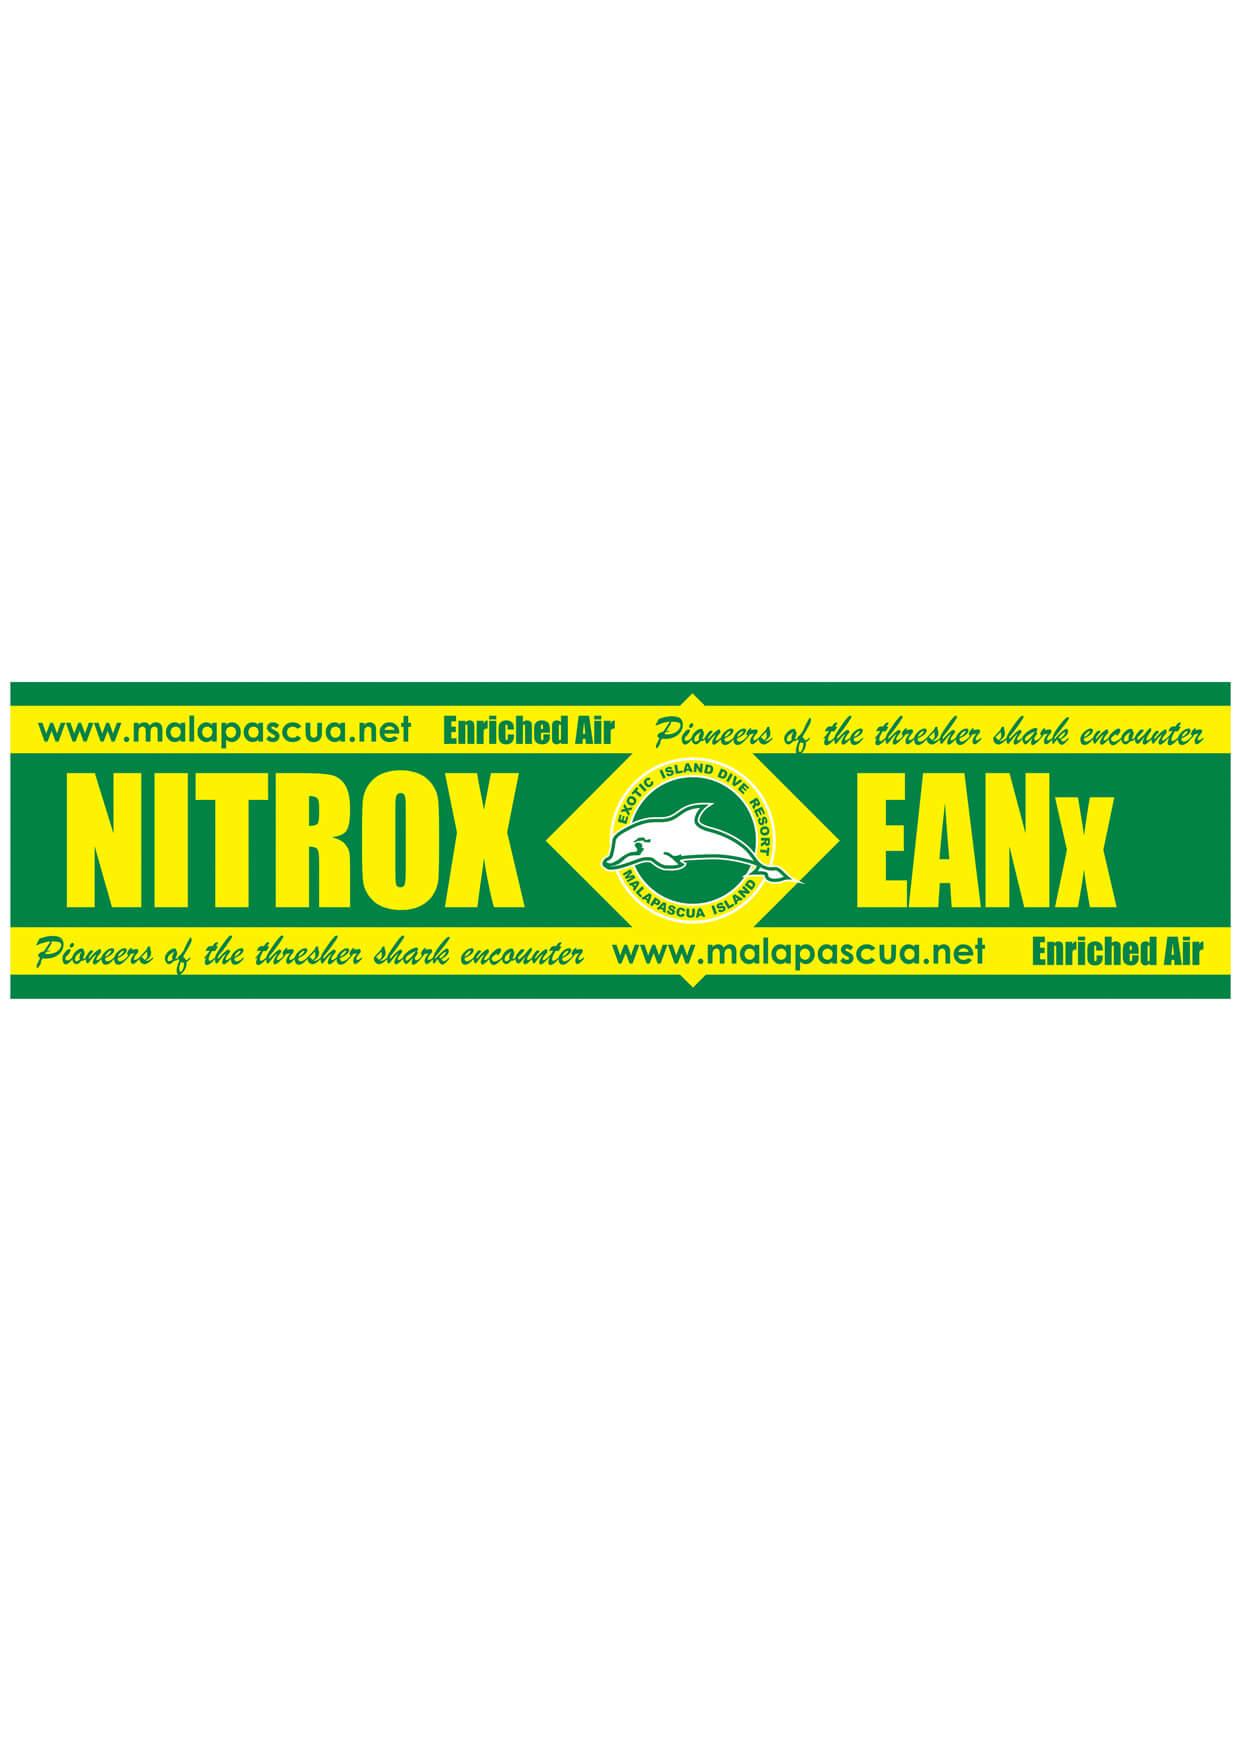 Malapascua Nitrox